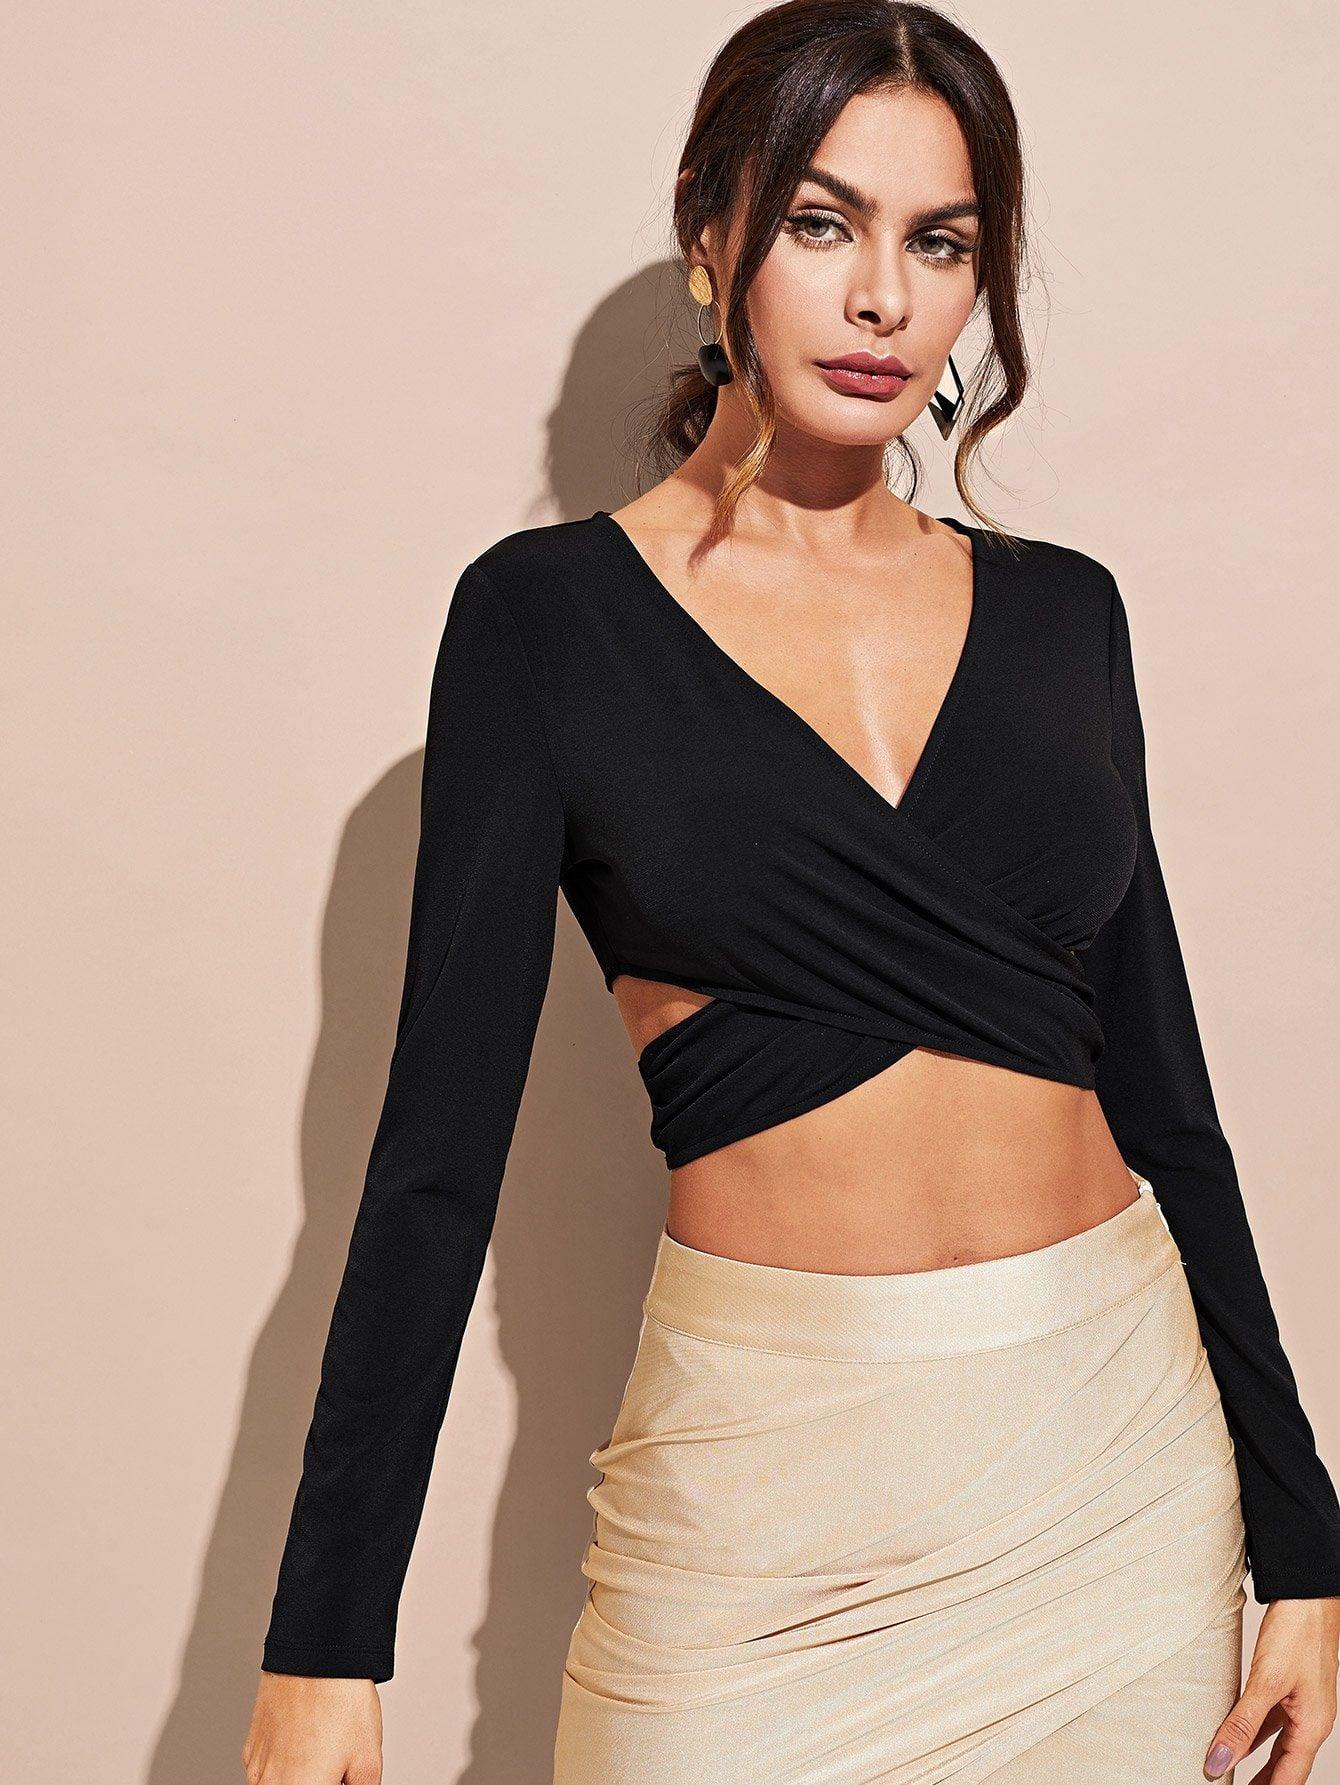 TOPUNDER Long Sleeve Solid Blouse V-Neck Knit Cardigan Women Shirt Bandage Crop Tops